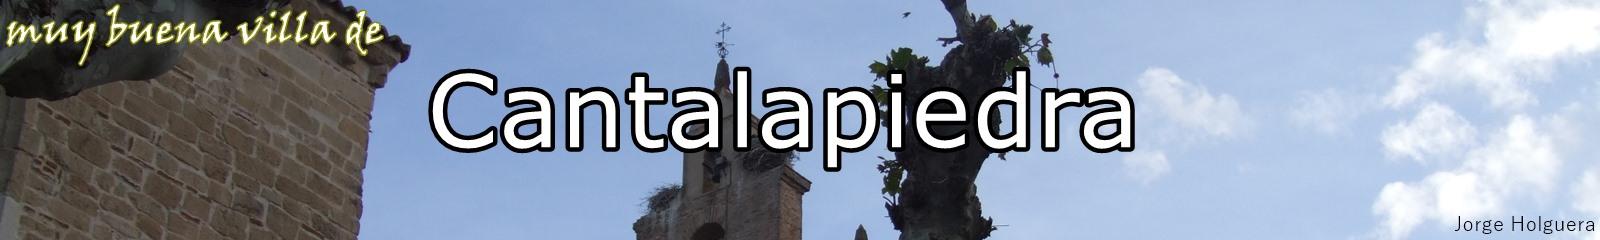 Cantalapiedra http://villadecantalapiedra.blogspot.com.es/